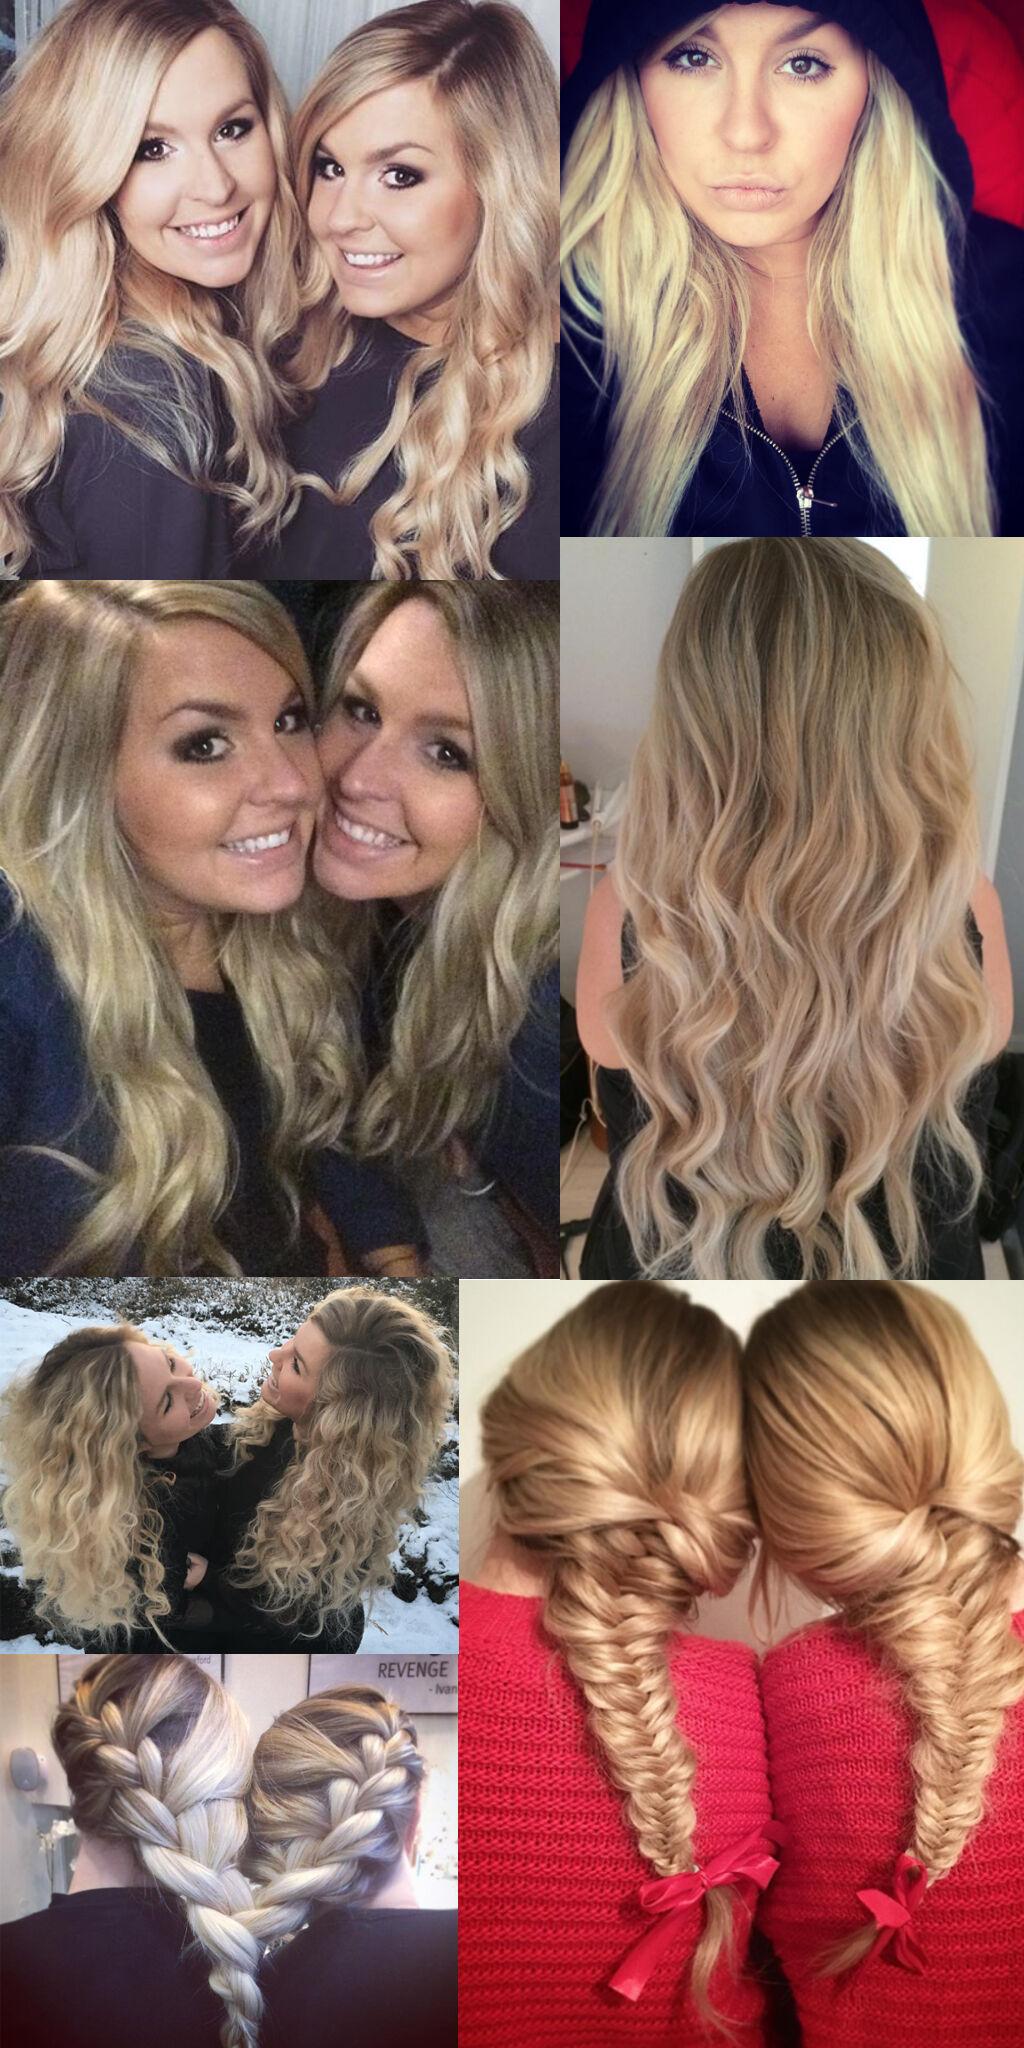 rapunzel_collage